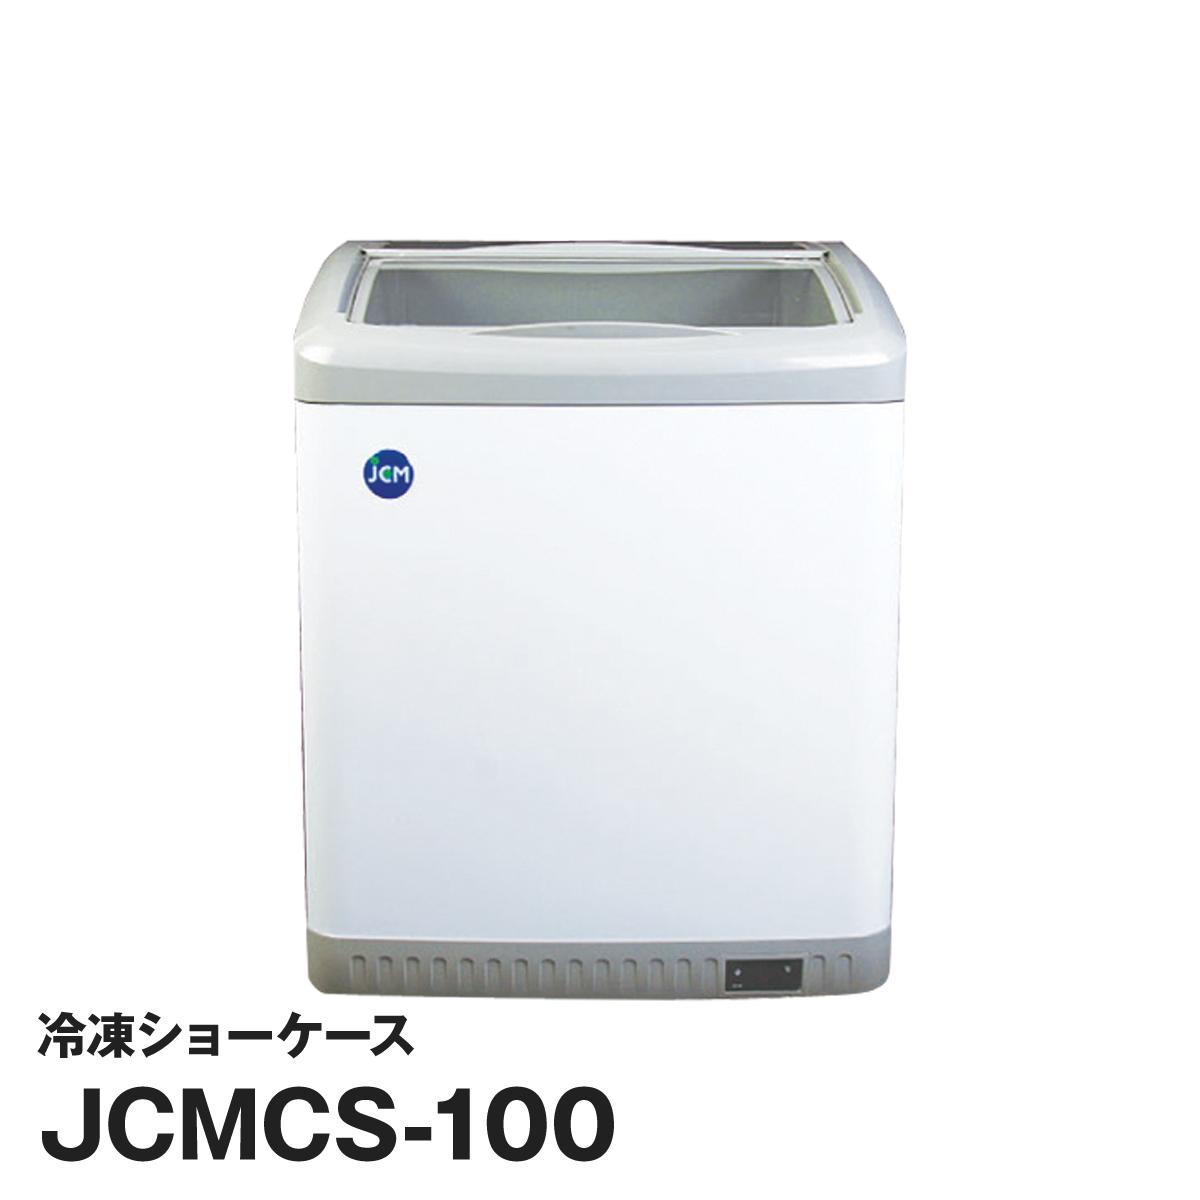 JCM社製 業務用 保冷庫 冷凍庫 103L スライド 冷凍ショーケース JCMCS-100 新品